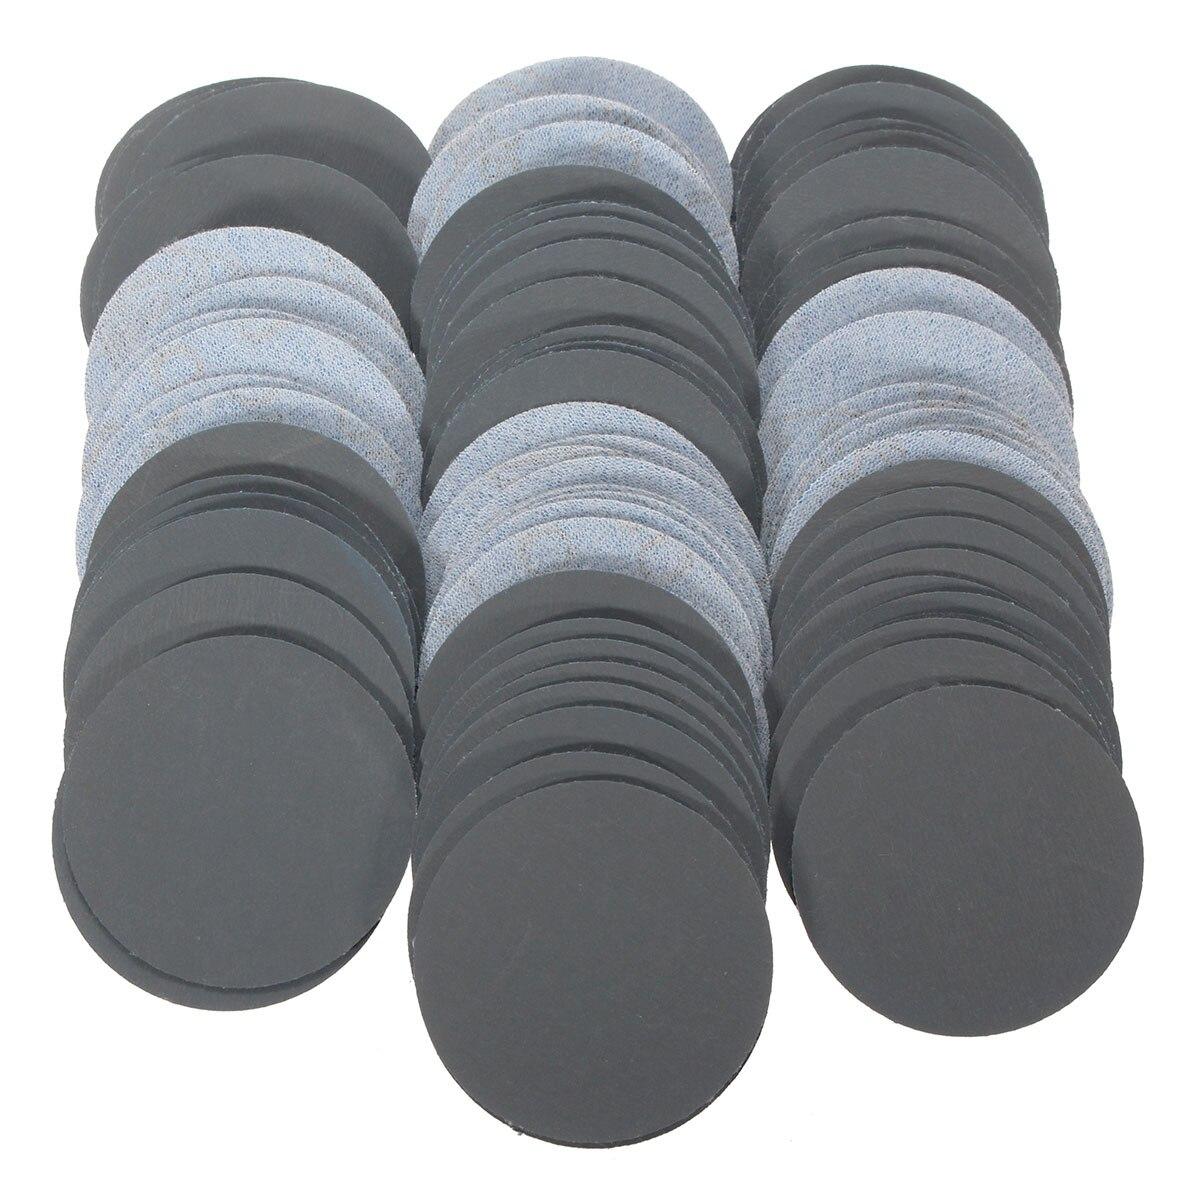 100pcs/set Sanding Disc 3000 Grit 2inch Sandpaper 50mm Polishing Pad Sandpaper For Cleaning Polishing Use